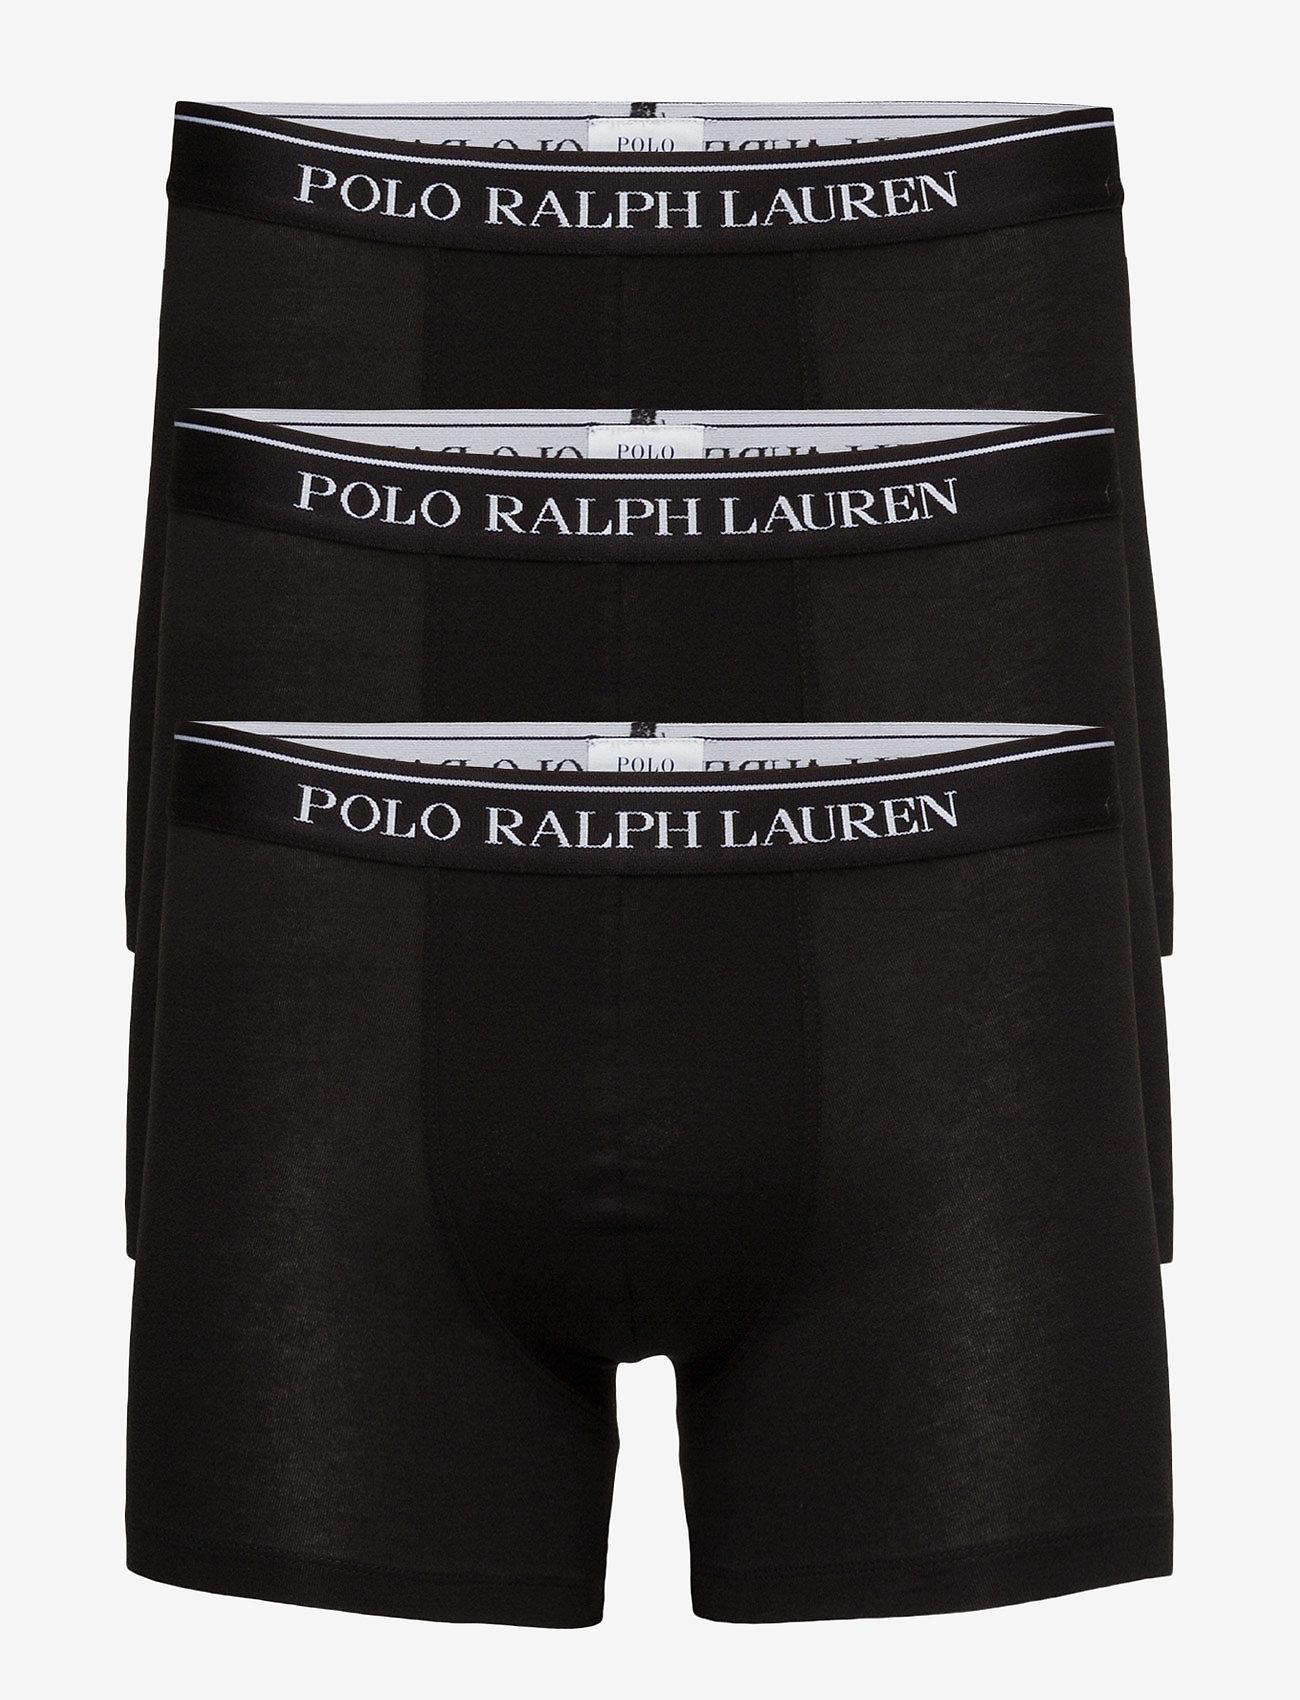 Polo Ralph Lauren Underwear - Stretch-Cotton-Trunk 3-Pack - boxers - 3pk polo blk - 0